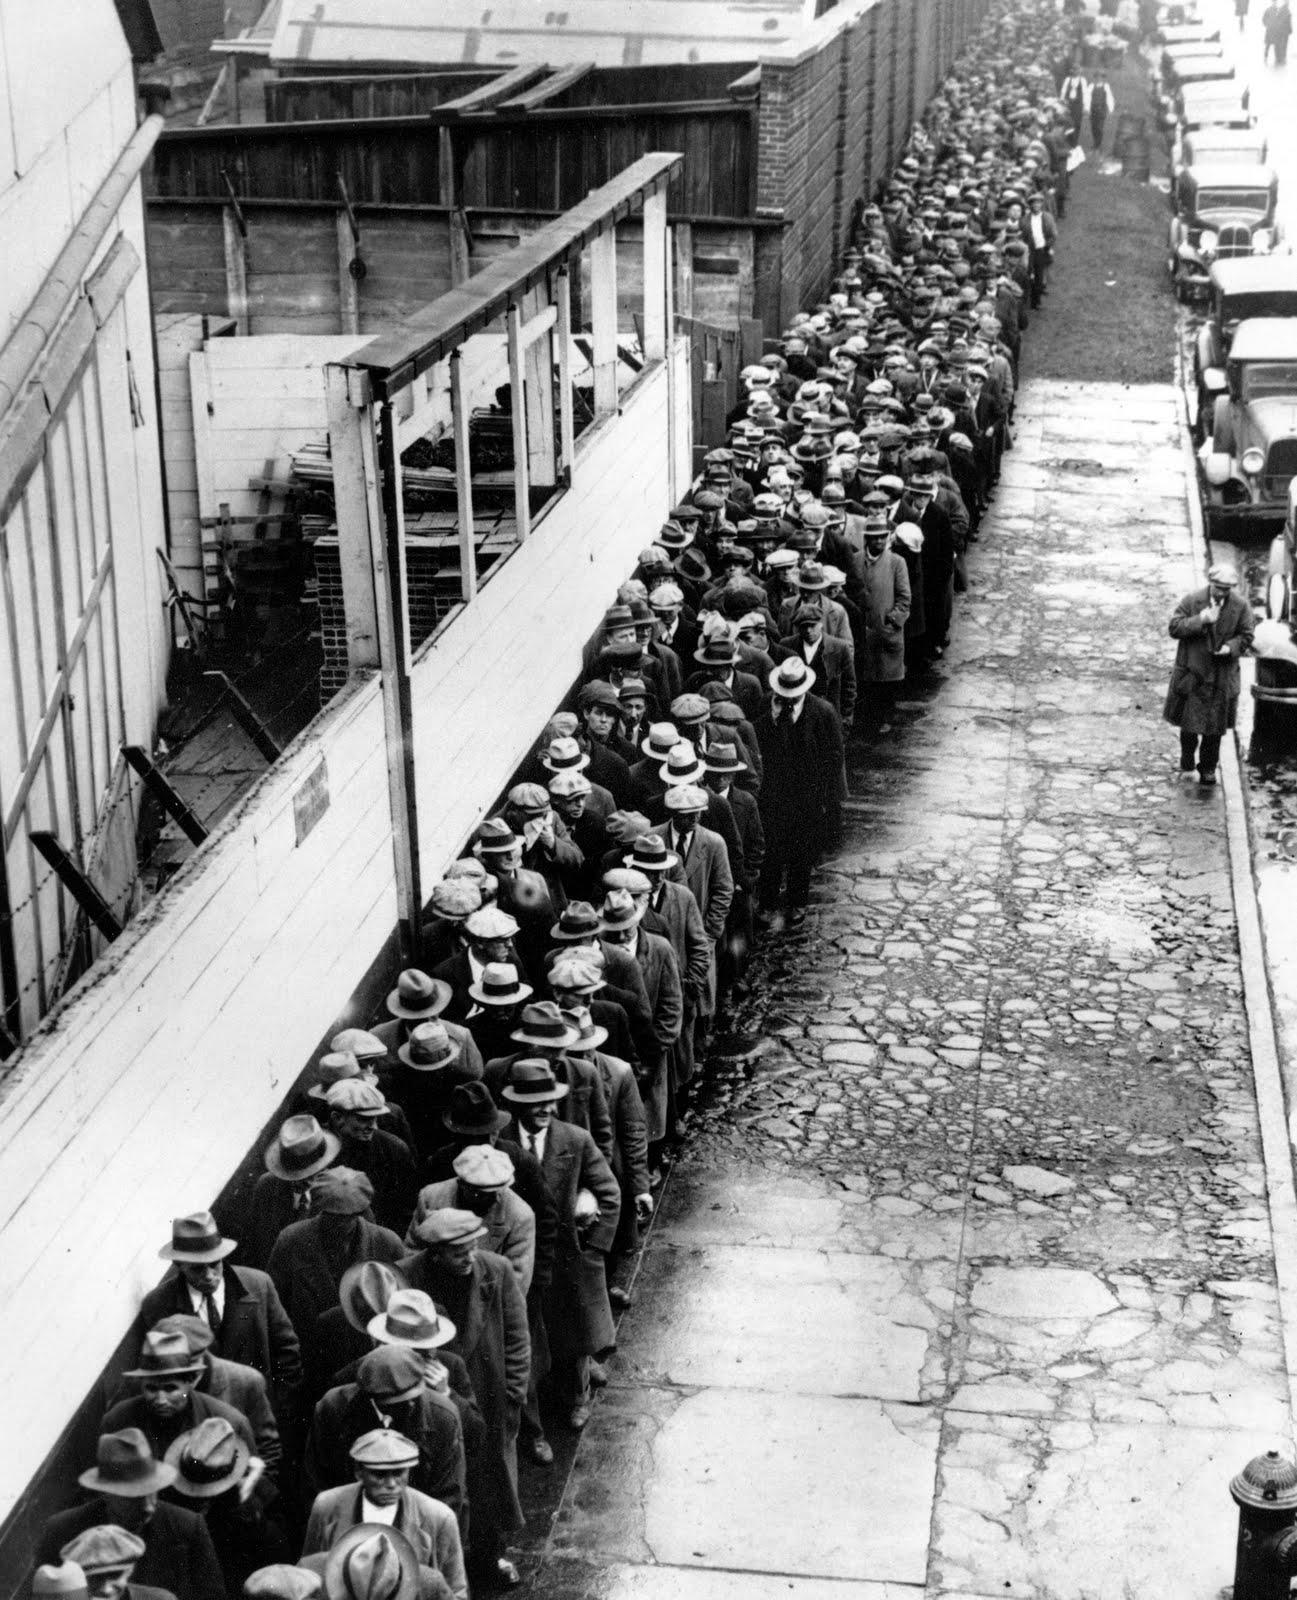 thirdwavedave: economic depression: defining what it is